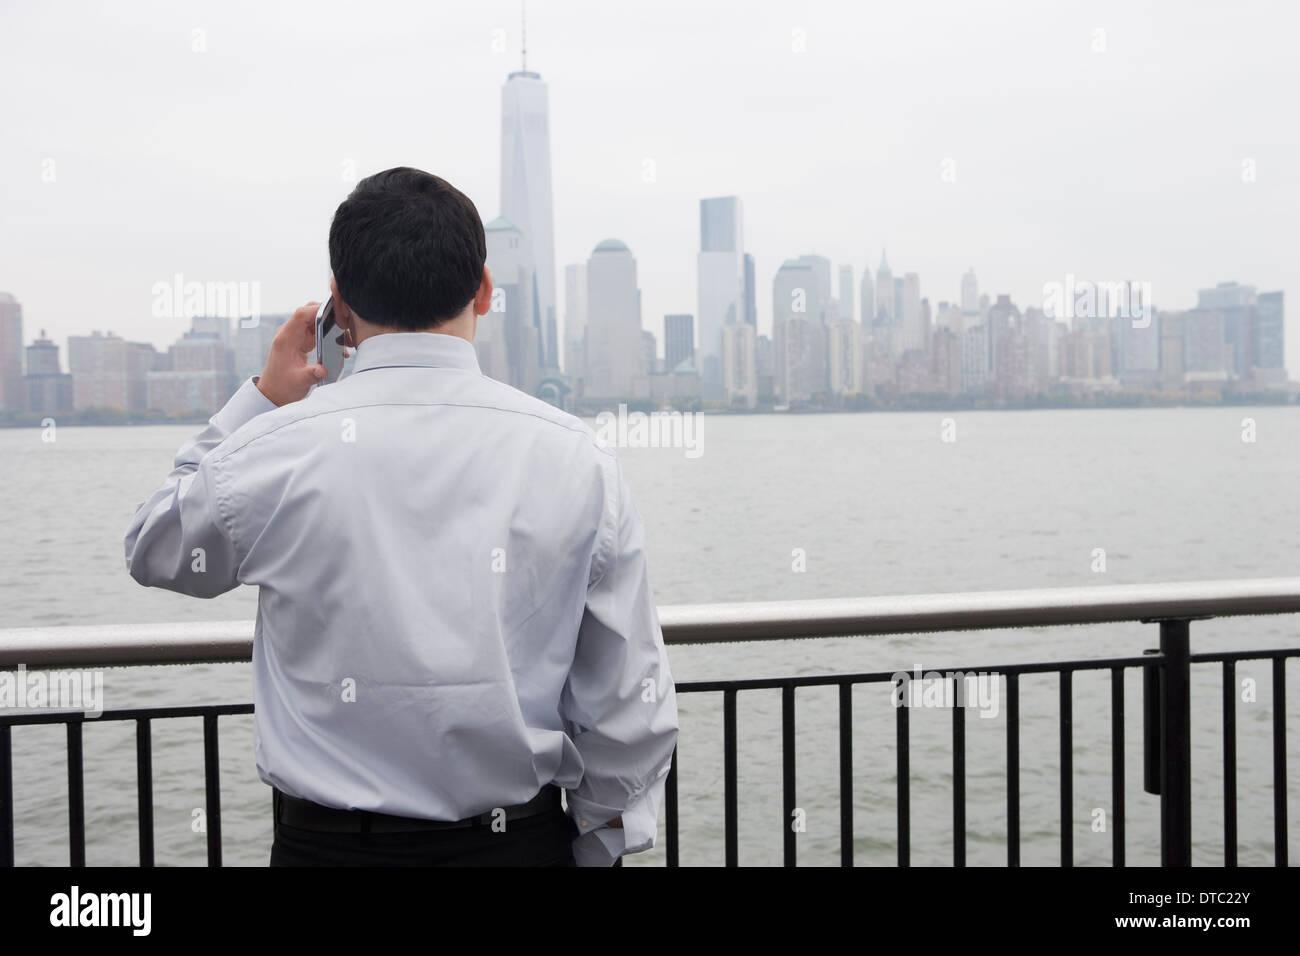 Businessman using cellular phone, Hoboken, New Jersey, USA Banque D'Images